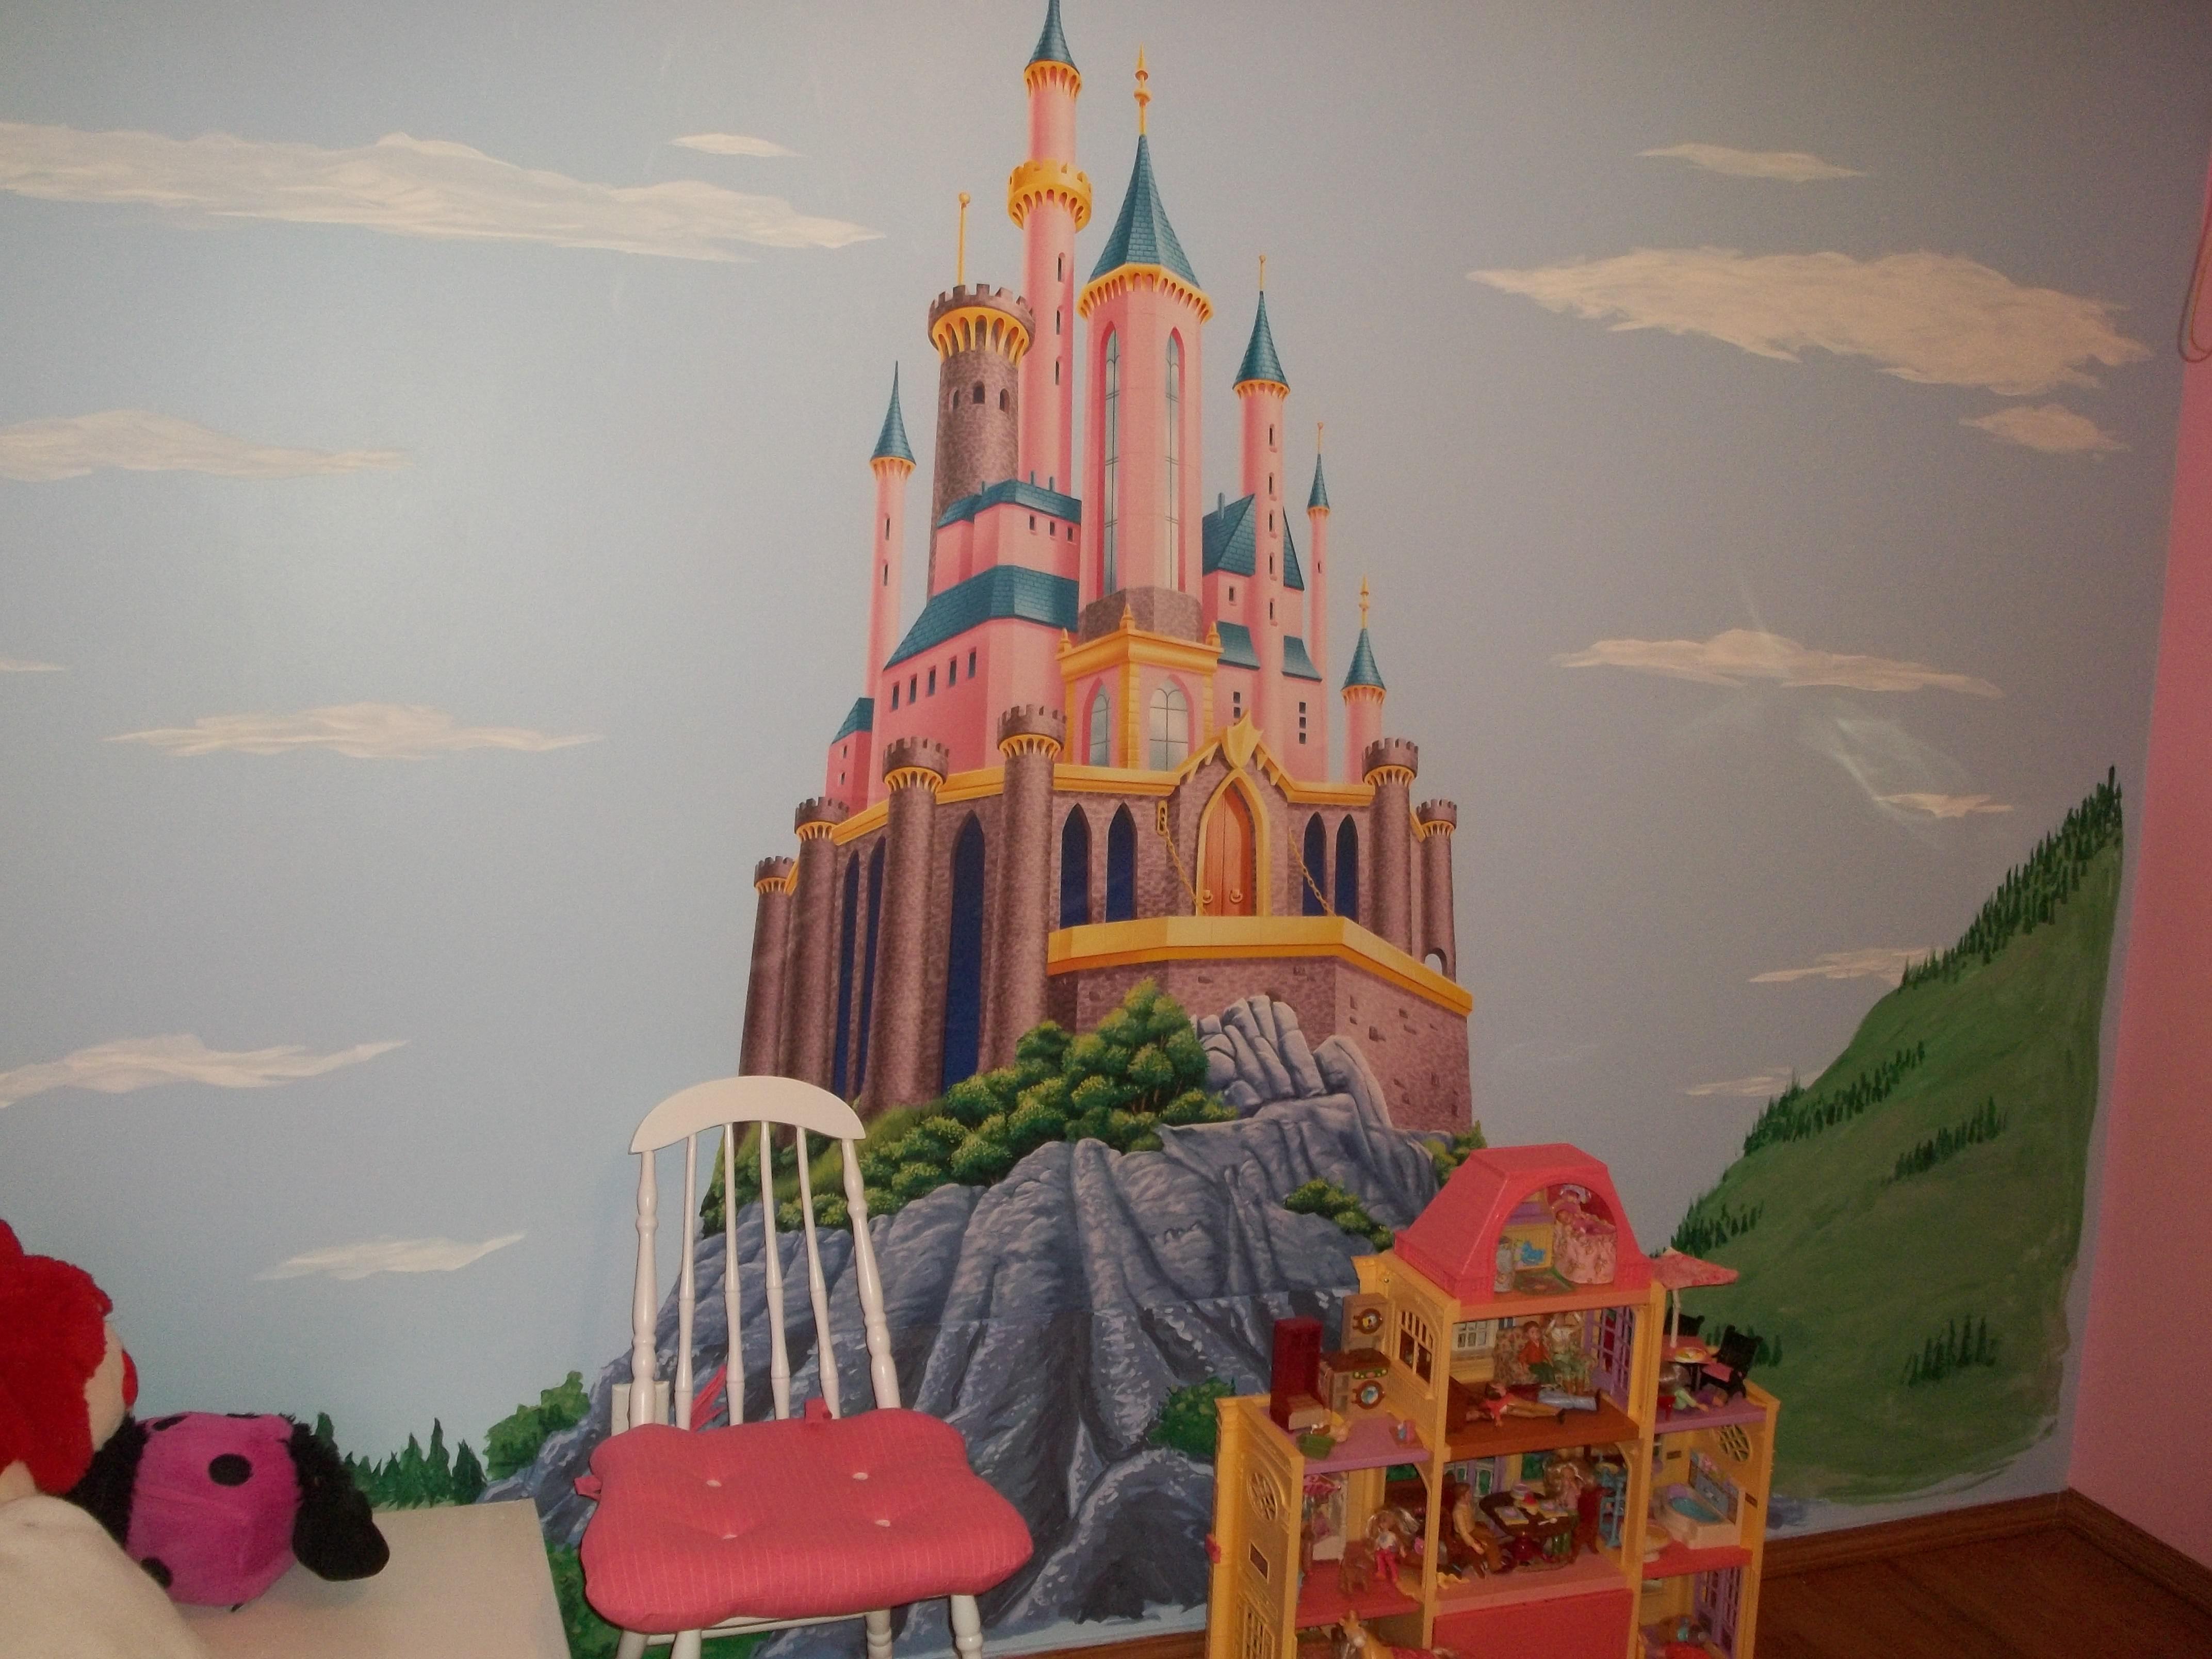 100 disney princess castle wall mural disney princesses in disney princess castle wall mural daughter s new disney princess bedroom d rezzed pop culture news